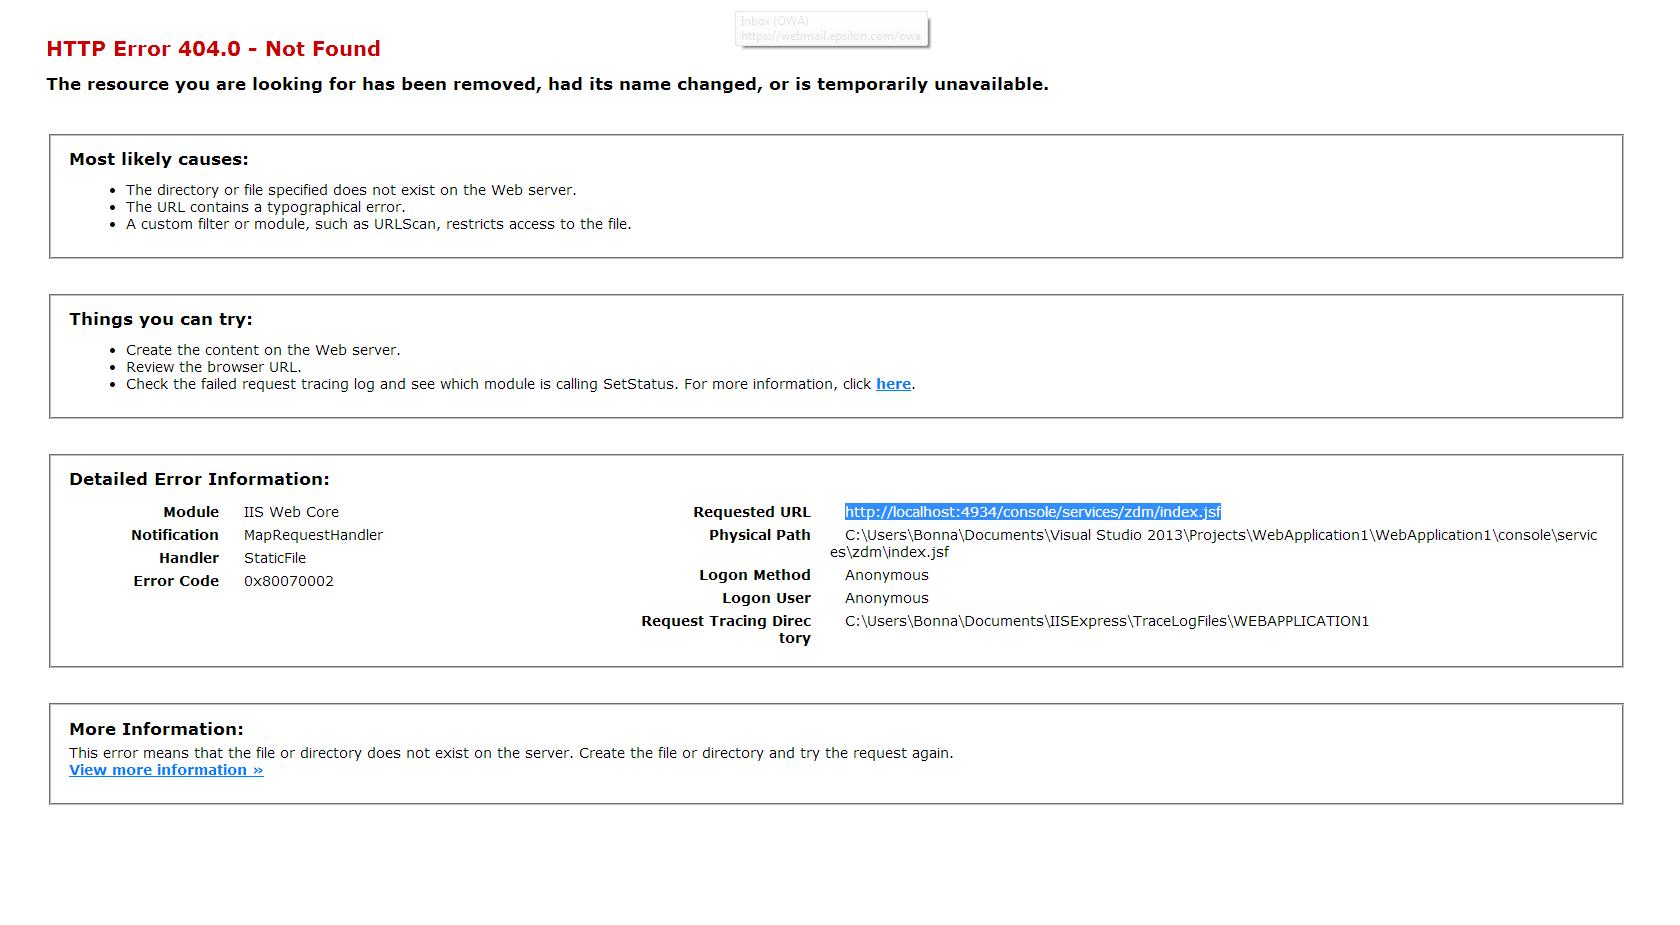 VB net - uploading a file to a web site